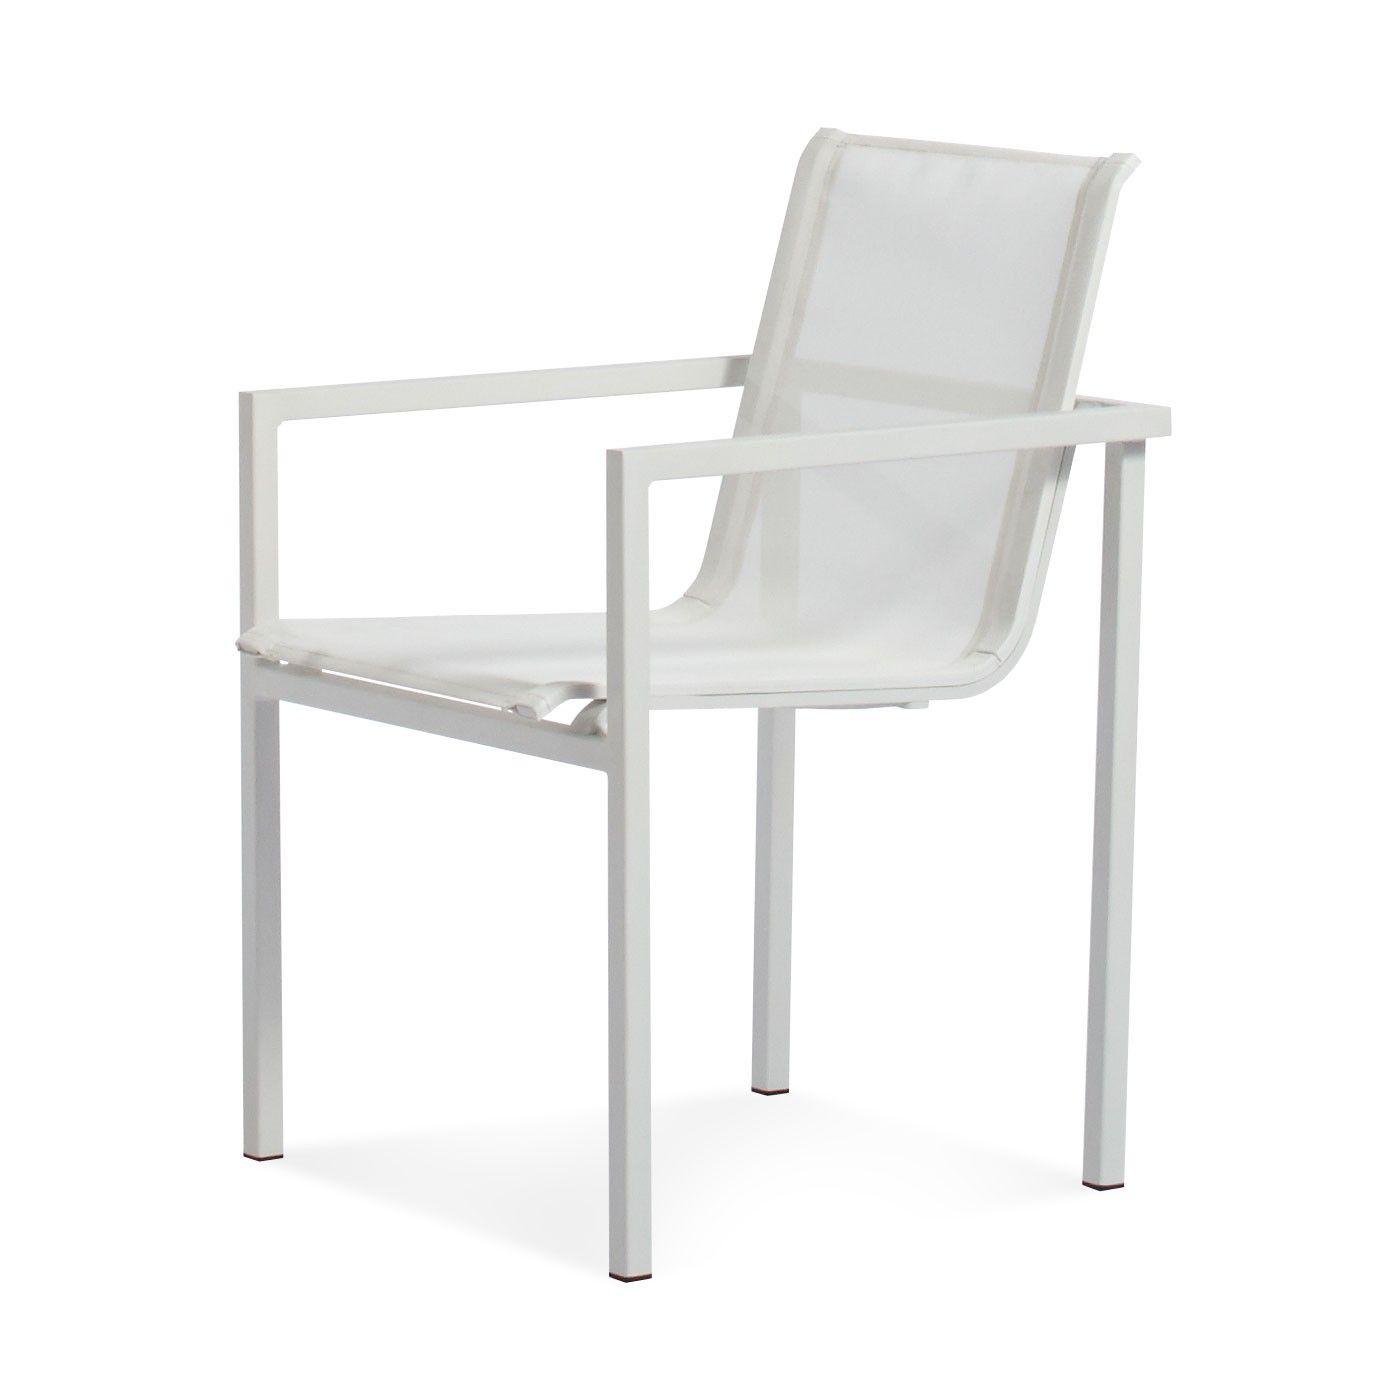 Skiff Outdoor Stacking Chair   Modern Outdoor Seating   Blu Dot